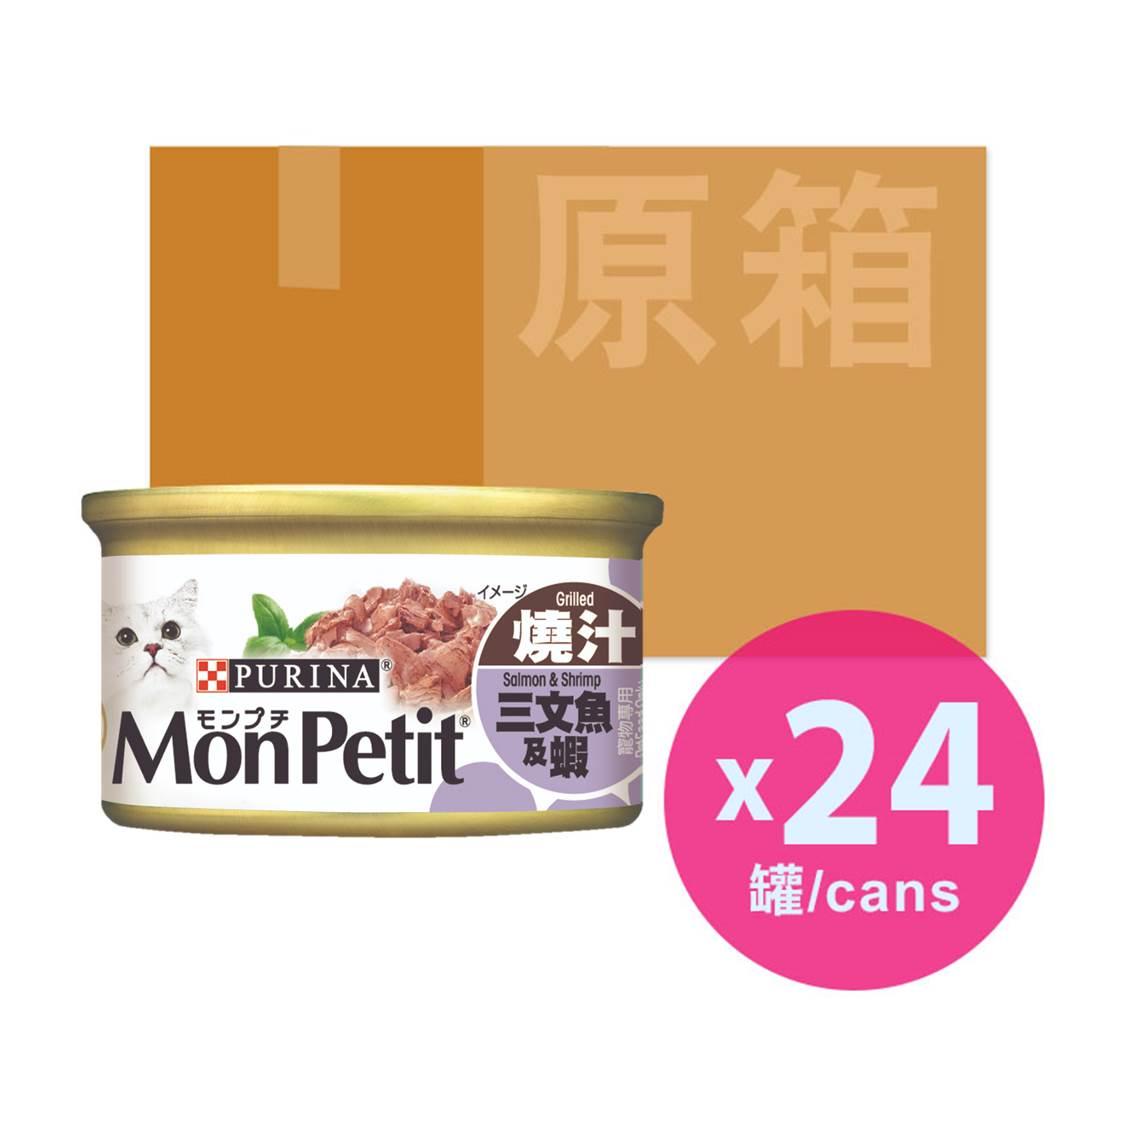 MON PETIT原箱至尊燒汁三文魚及蝦24X85G